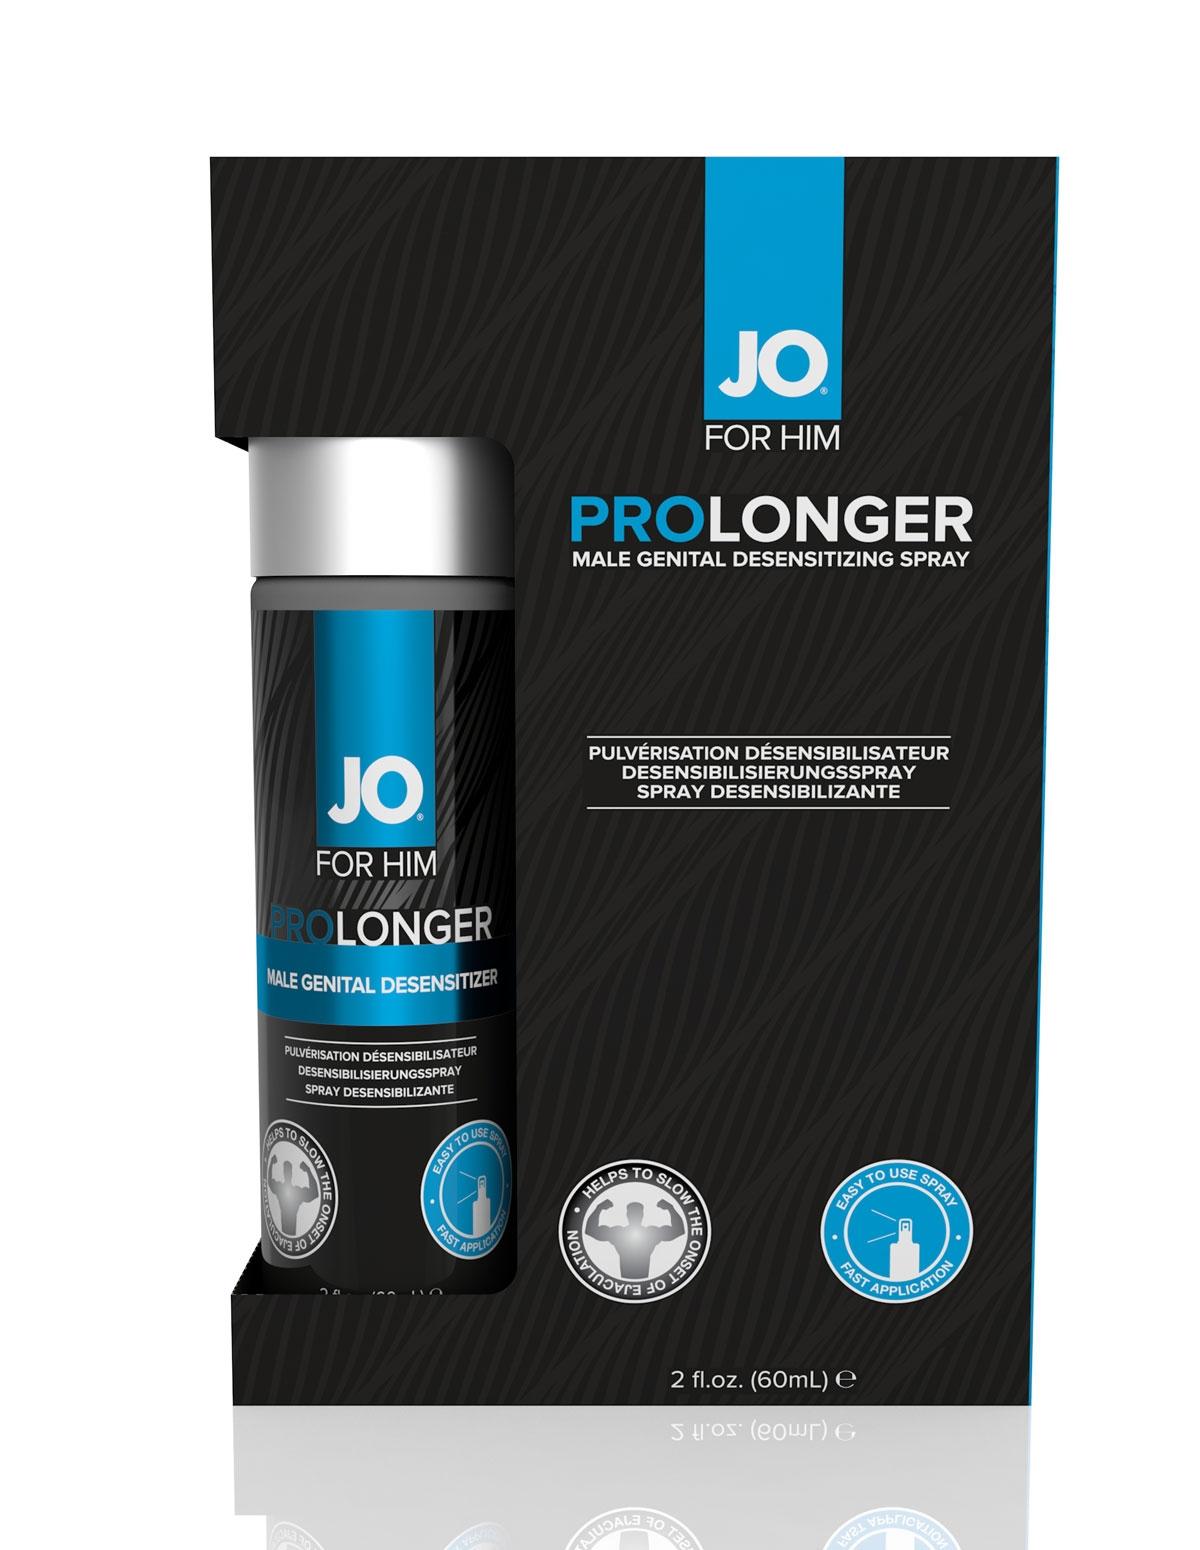 Jo Prolonger Spray 2Oz